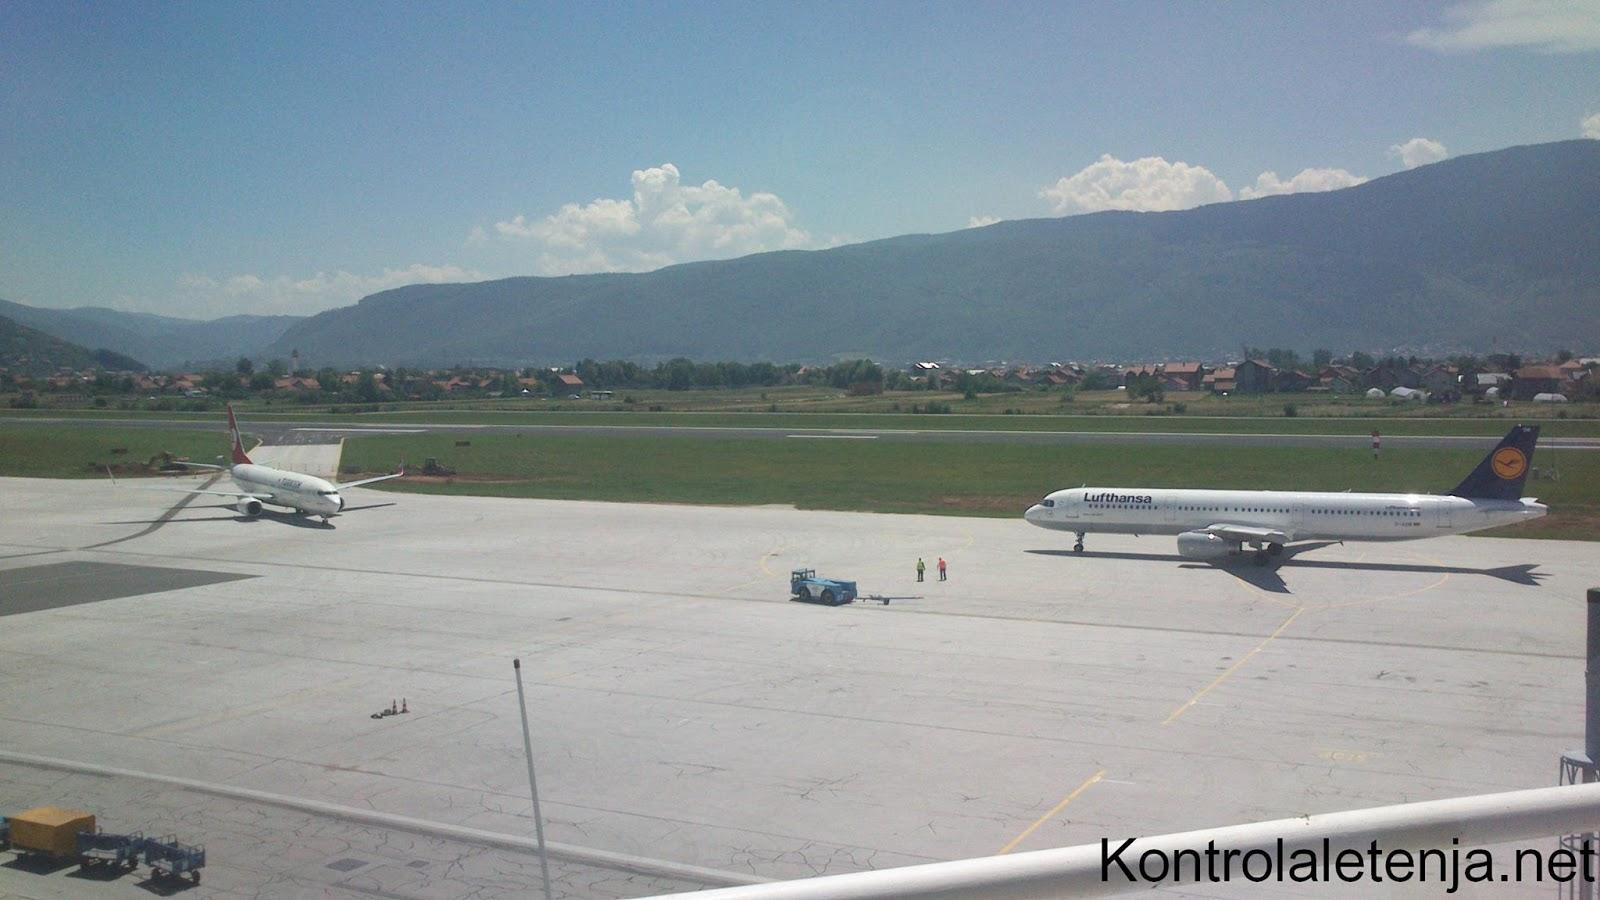 Bosnia and Herzegovina aviation news: ✈Sarajevo airport air traffic